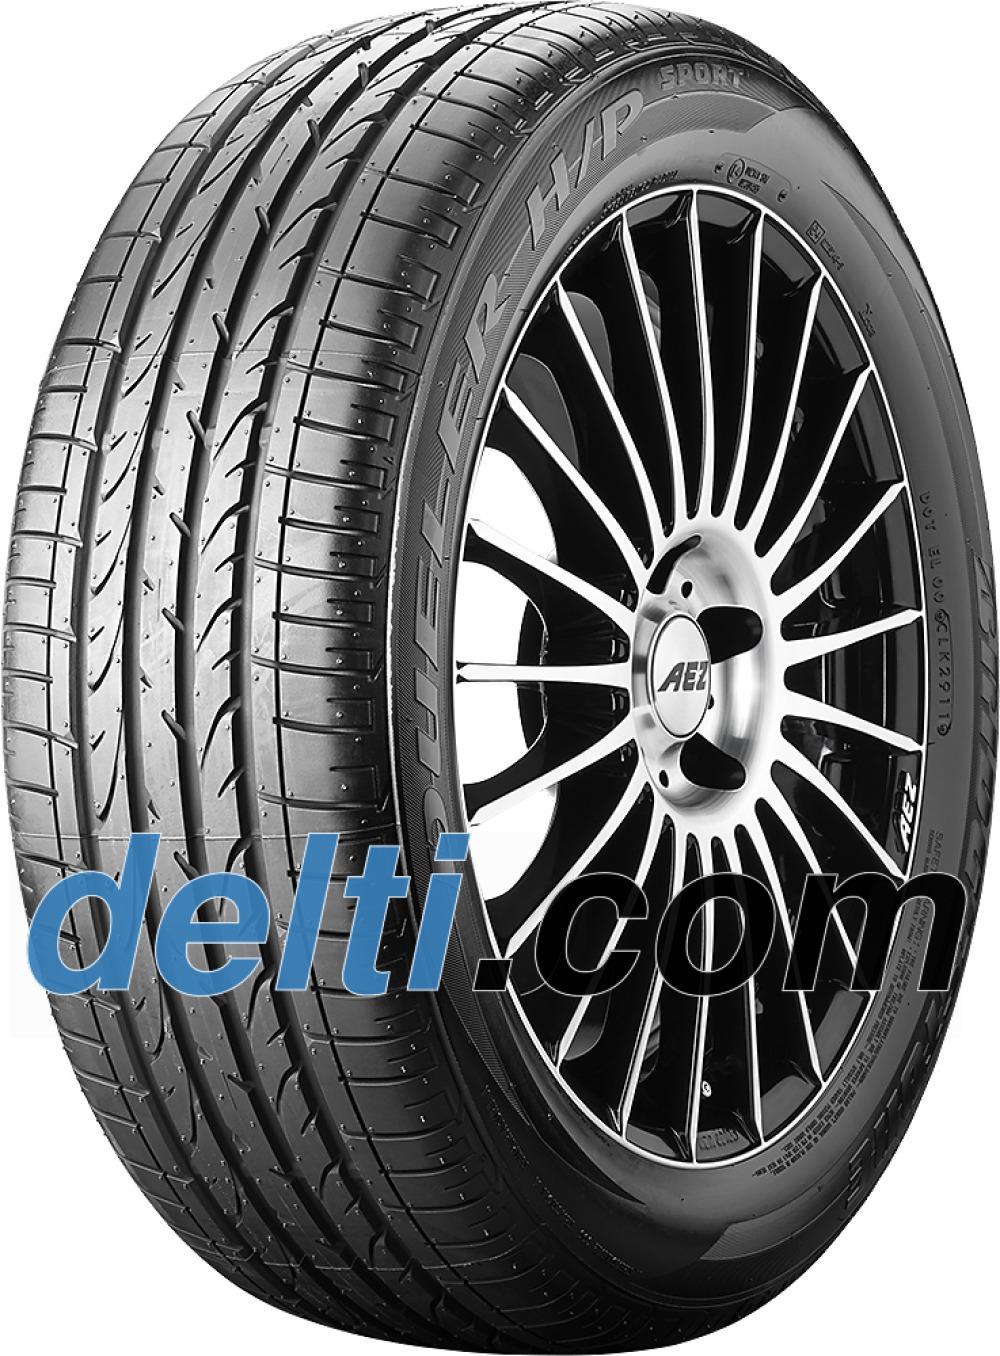 Bridgestone Dueler H/P Sport ( 215/65 R16 102H XL med fælgbeskyttelses liste (FSL) )